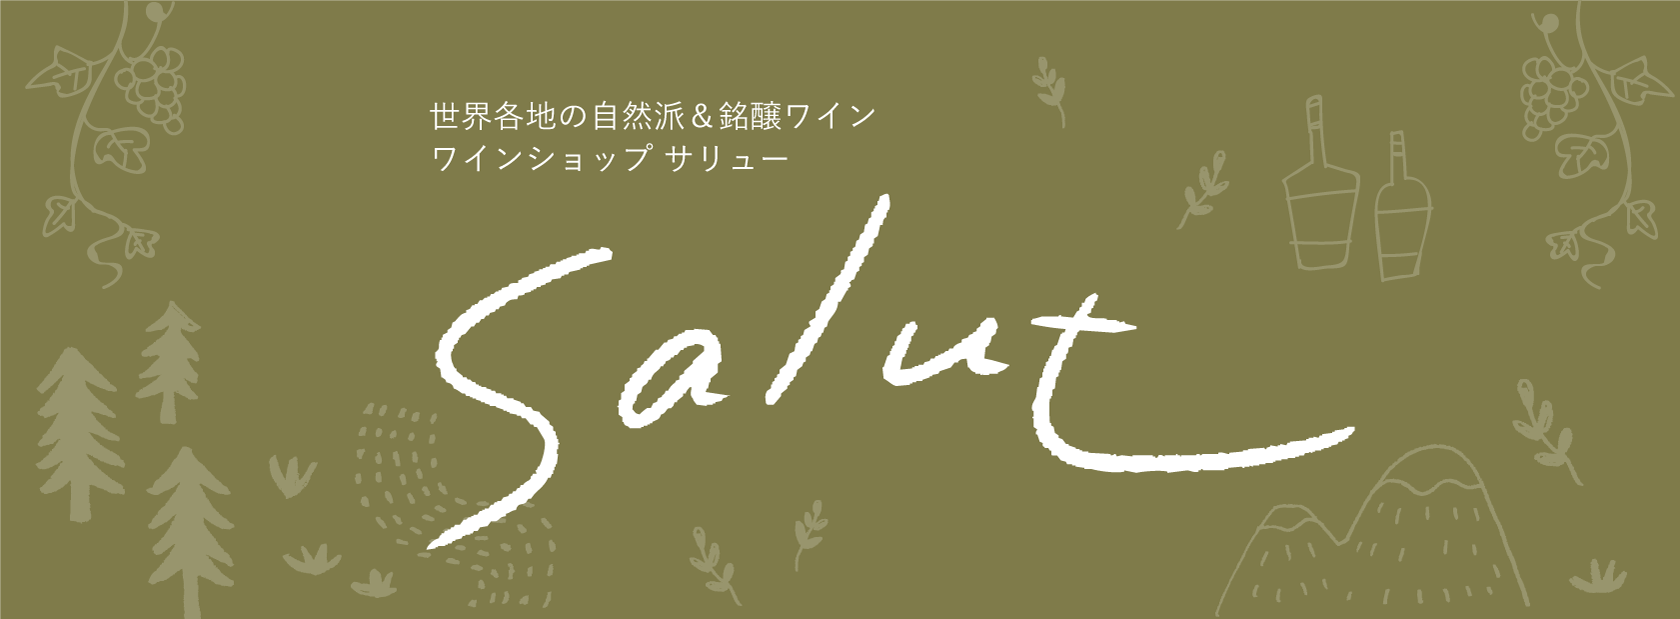 Wine Shop Salut - 世界各地の自然派&銘醸ワイン ワインショップ サリュー